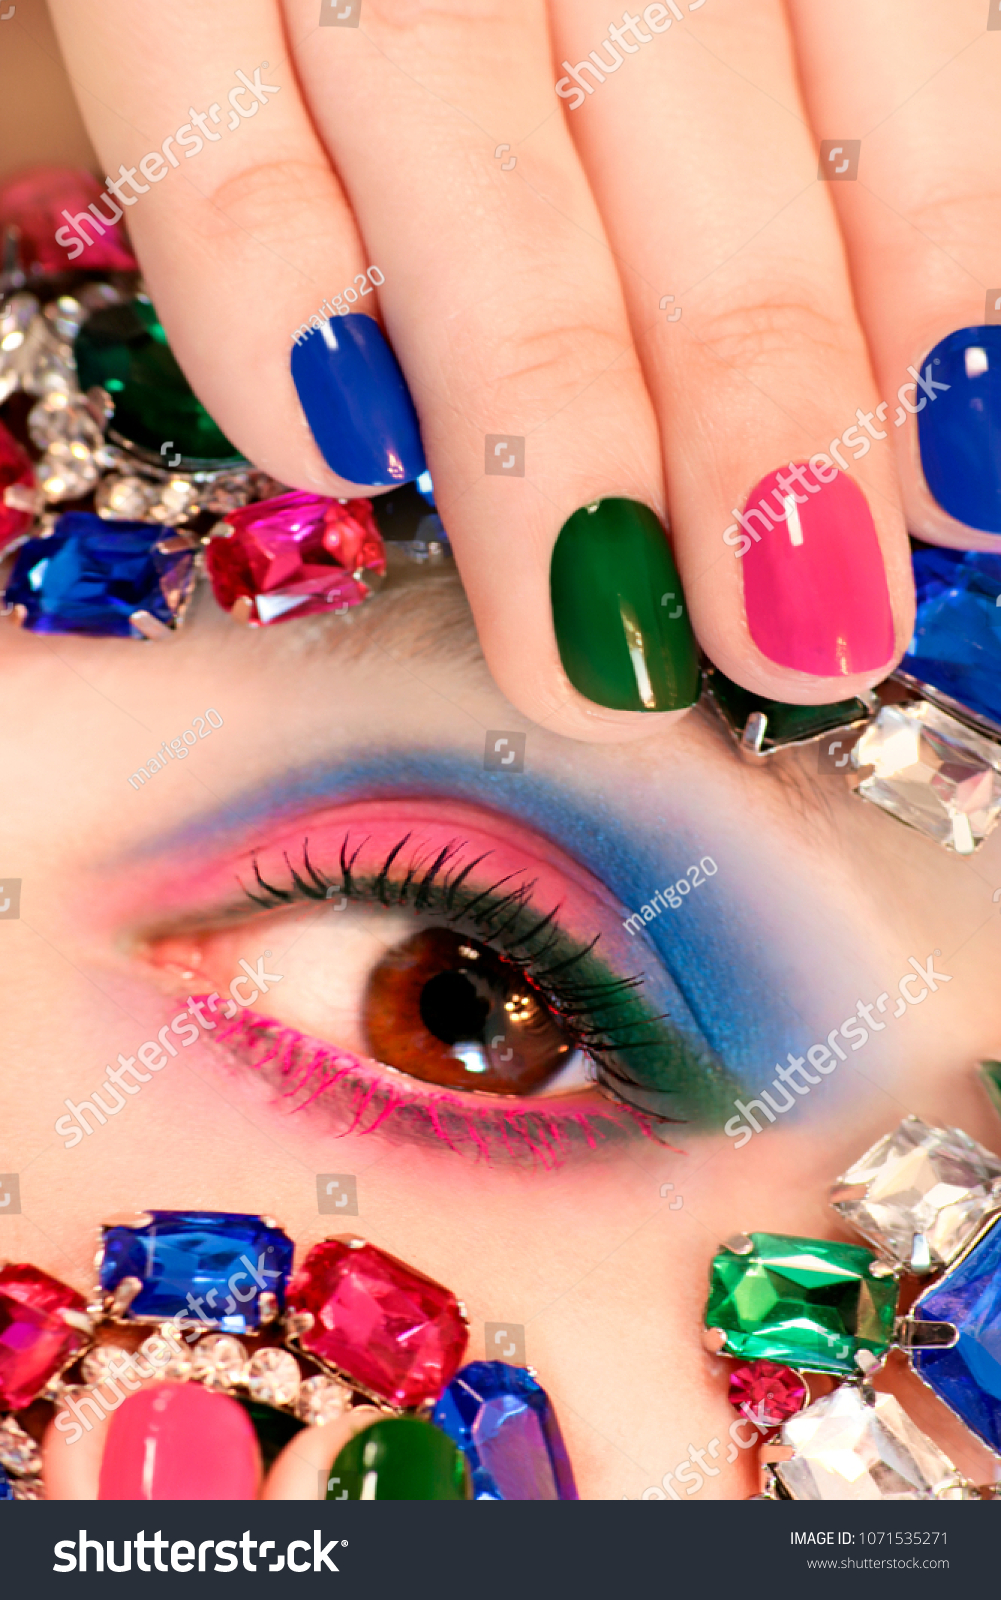 Fashionable Colorful Short Nail Art Design Stock Photo (Royalty Free ...